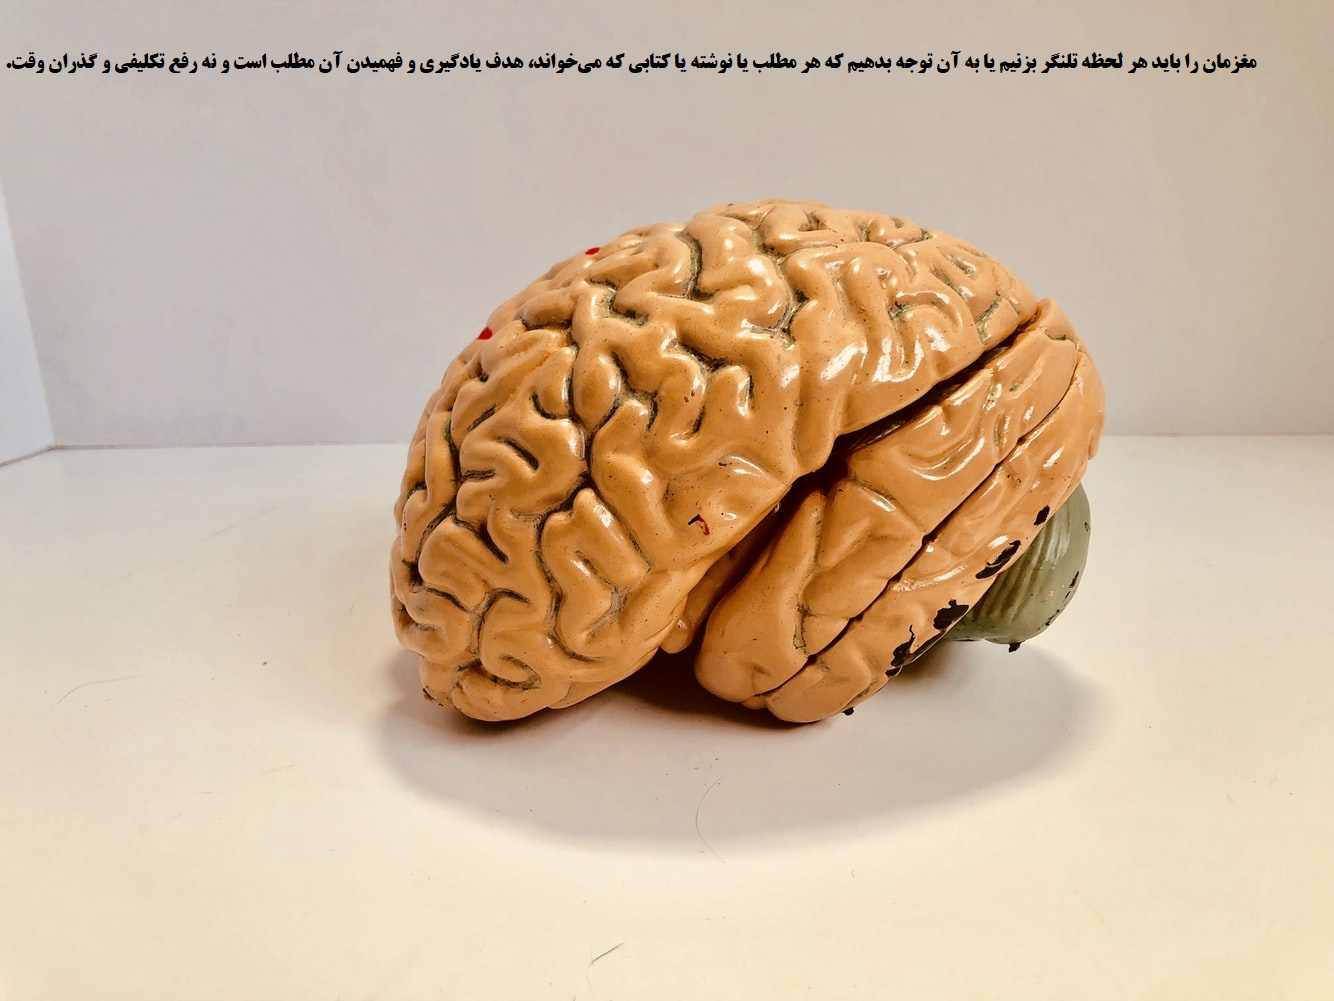 مغز. یادگیری